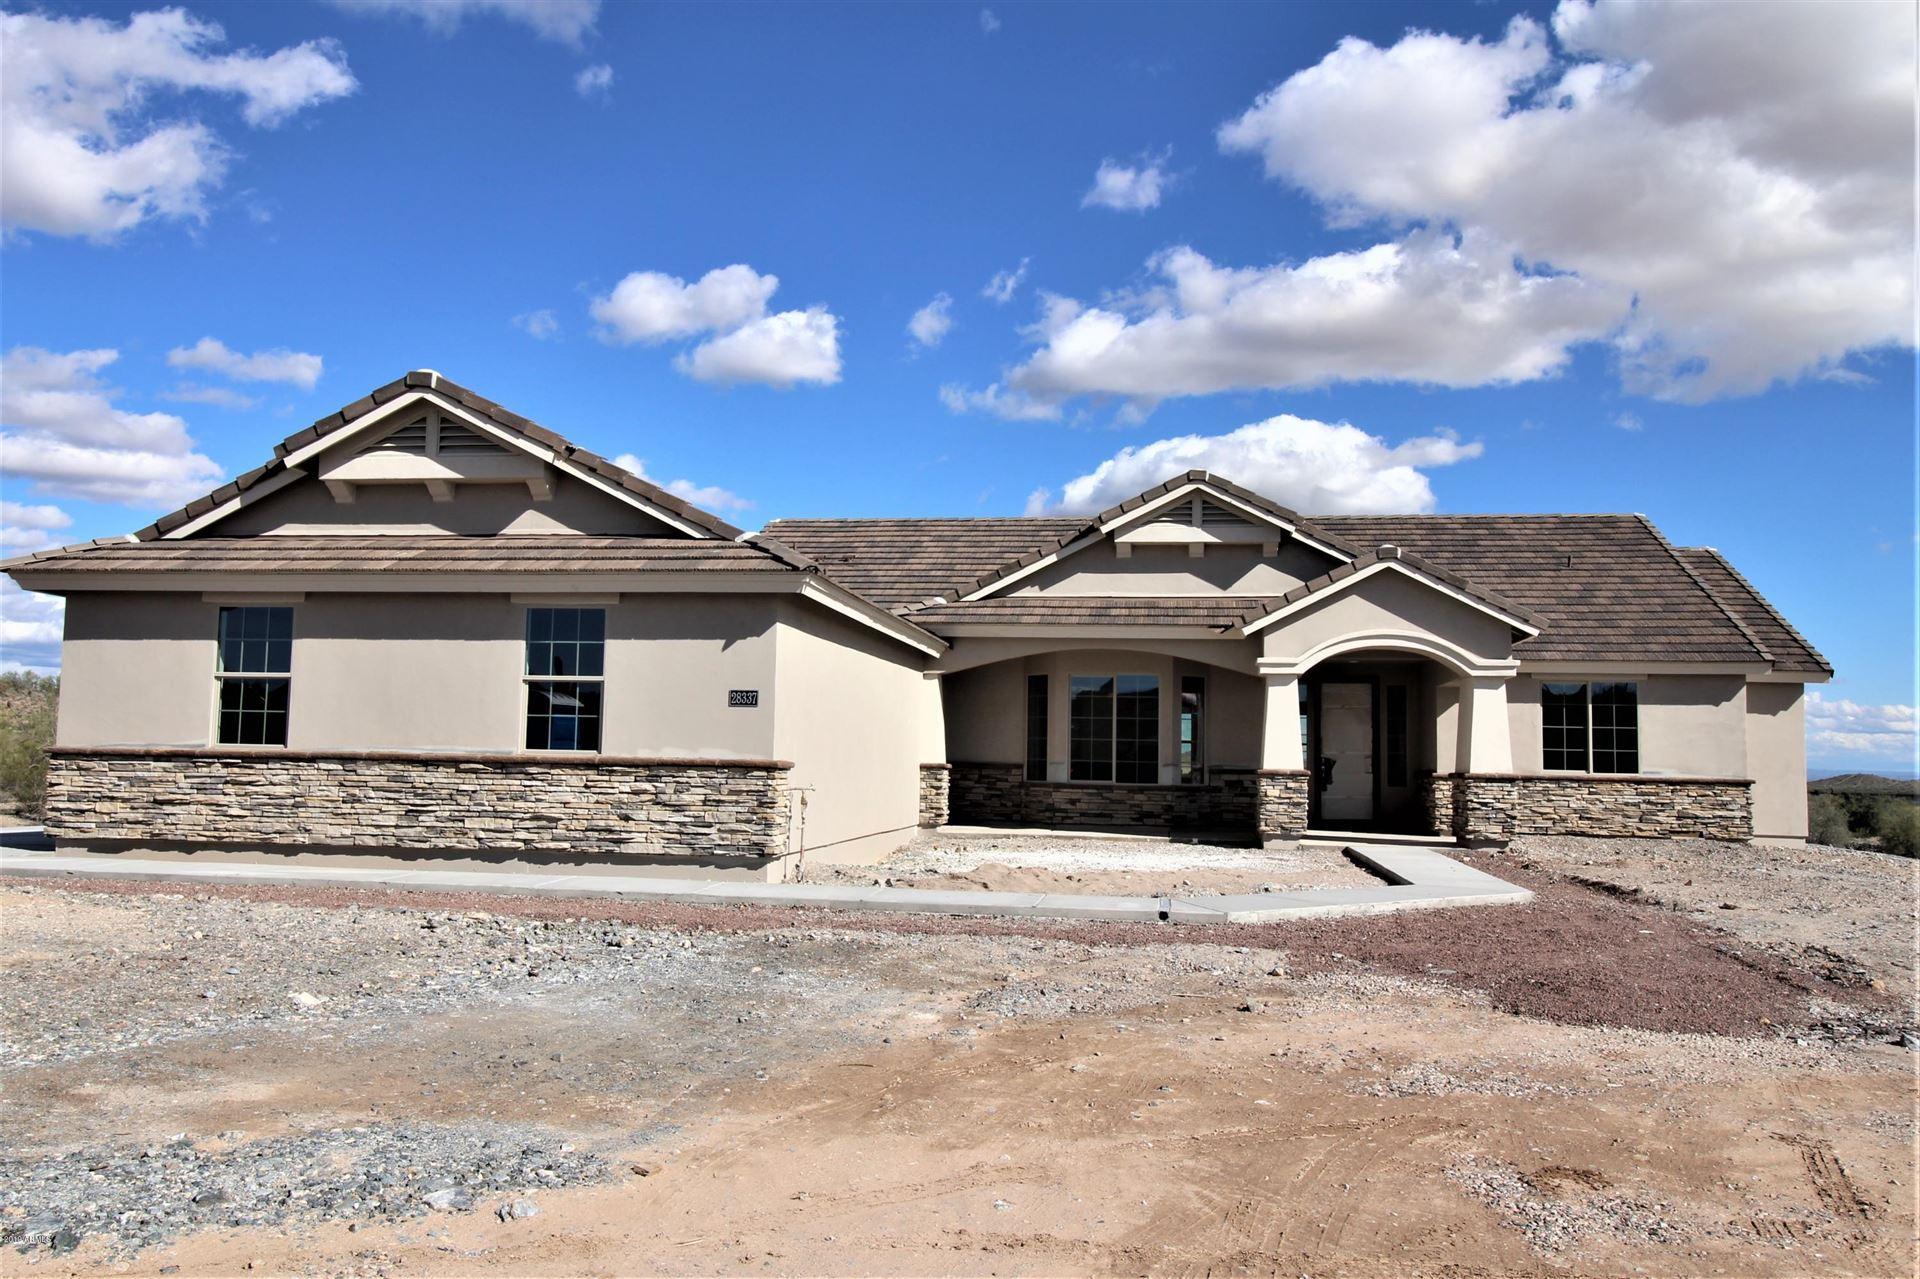 12 E Tumbleweed Drive, Phoenix, AZ 85085 - MLS#: 6219757